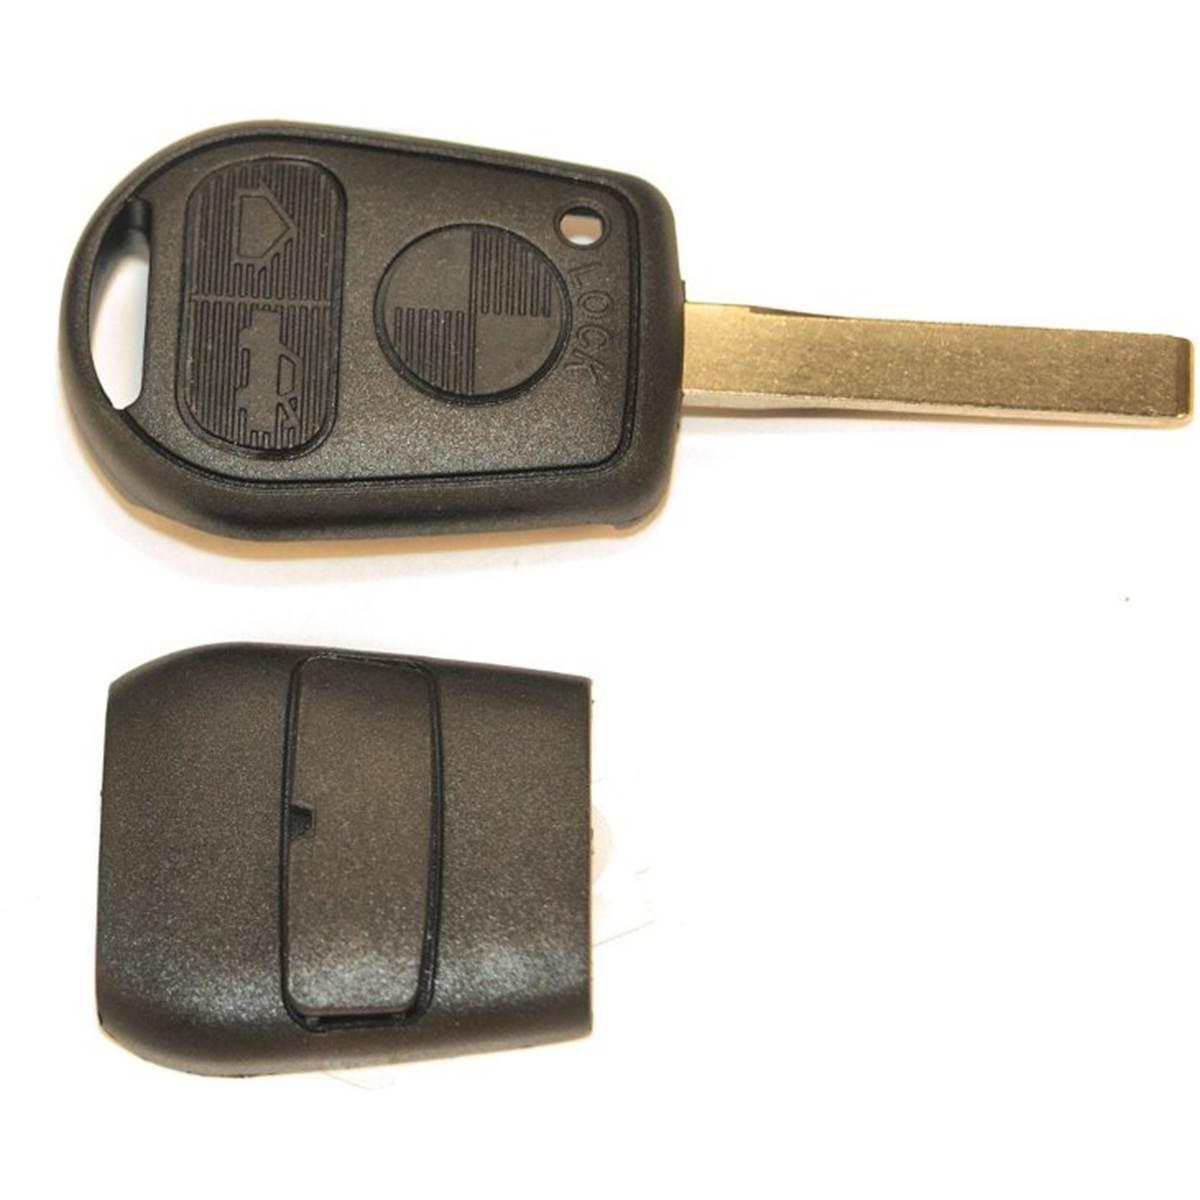 Coque de clé pour BMW BMW35